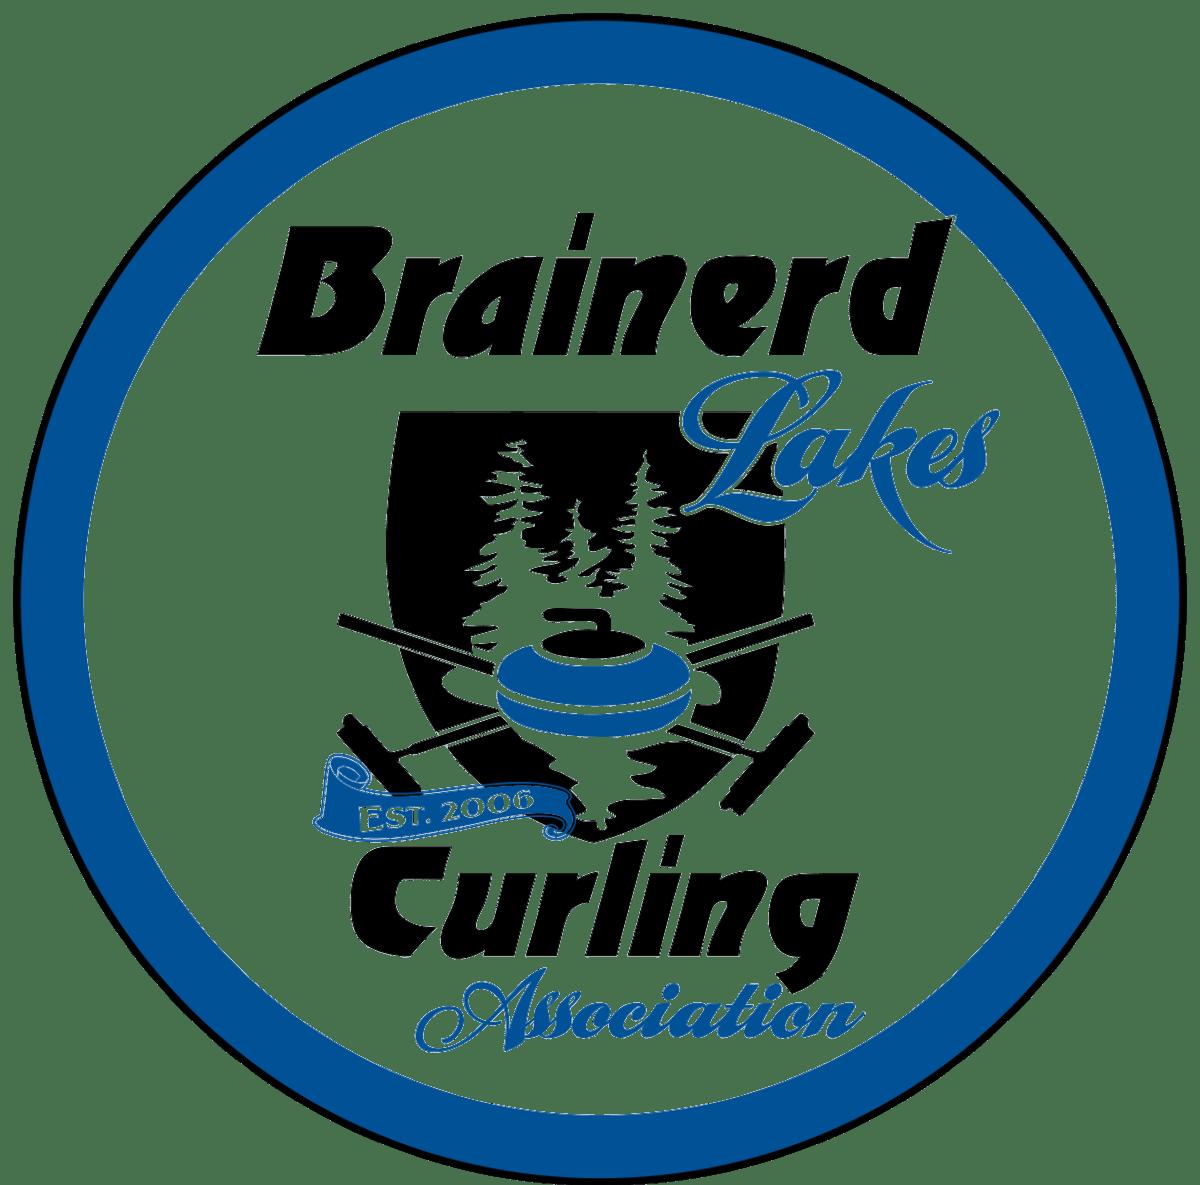 Brainerd Lakes Curling_Logo